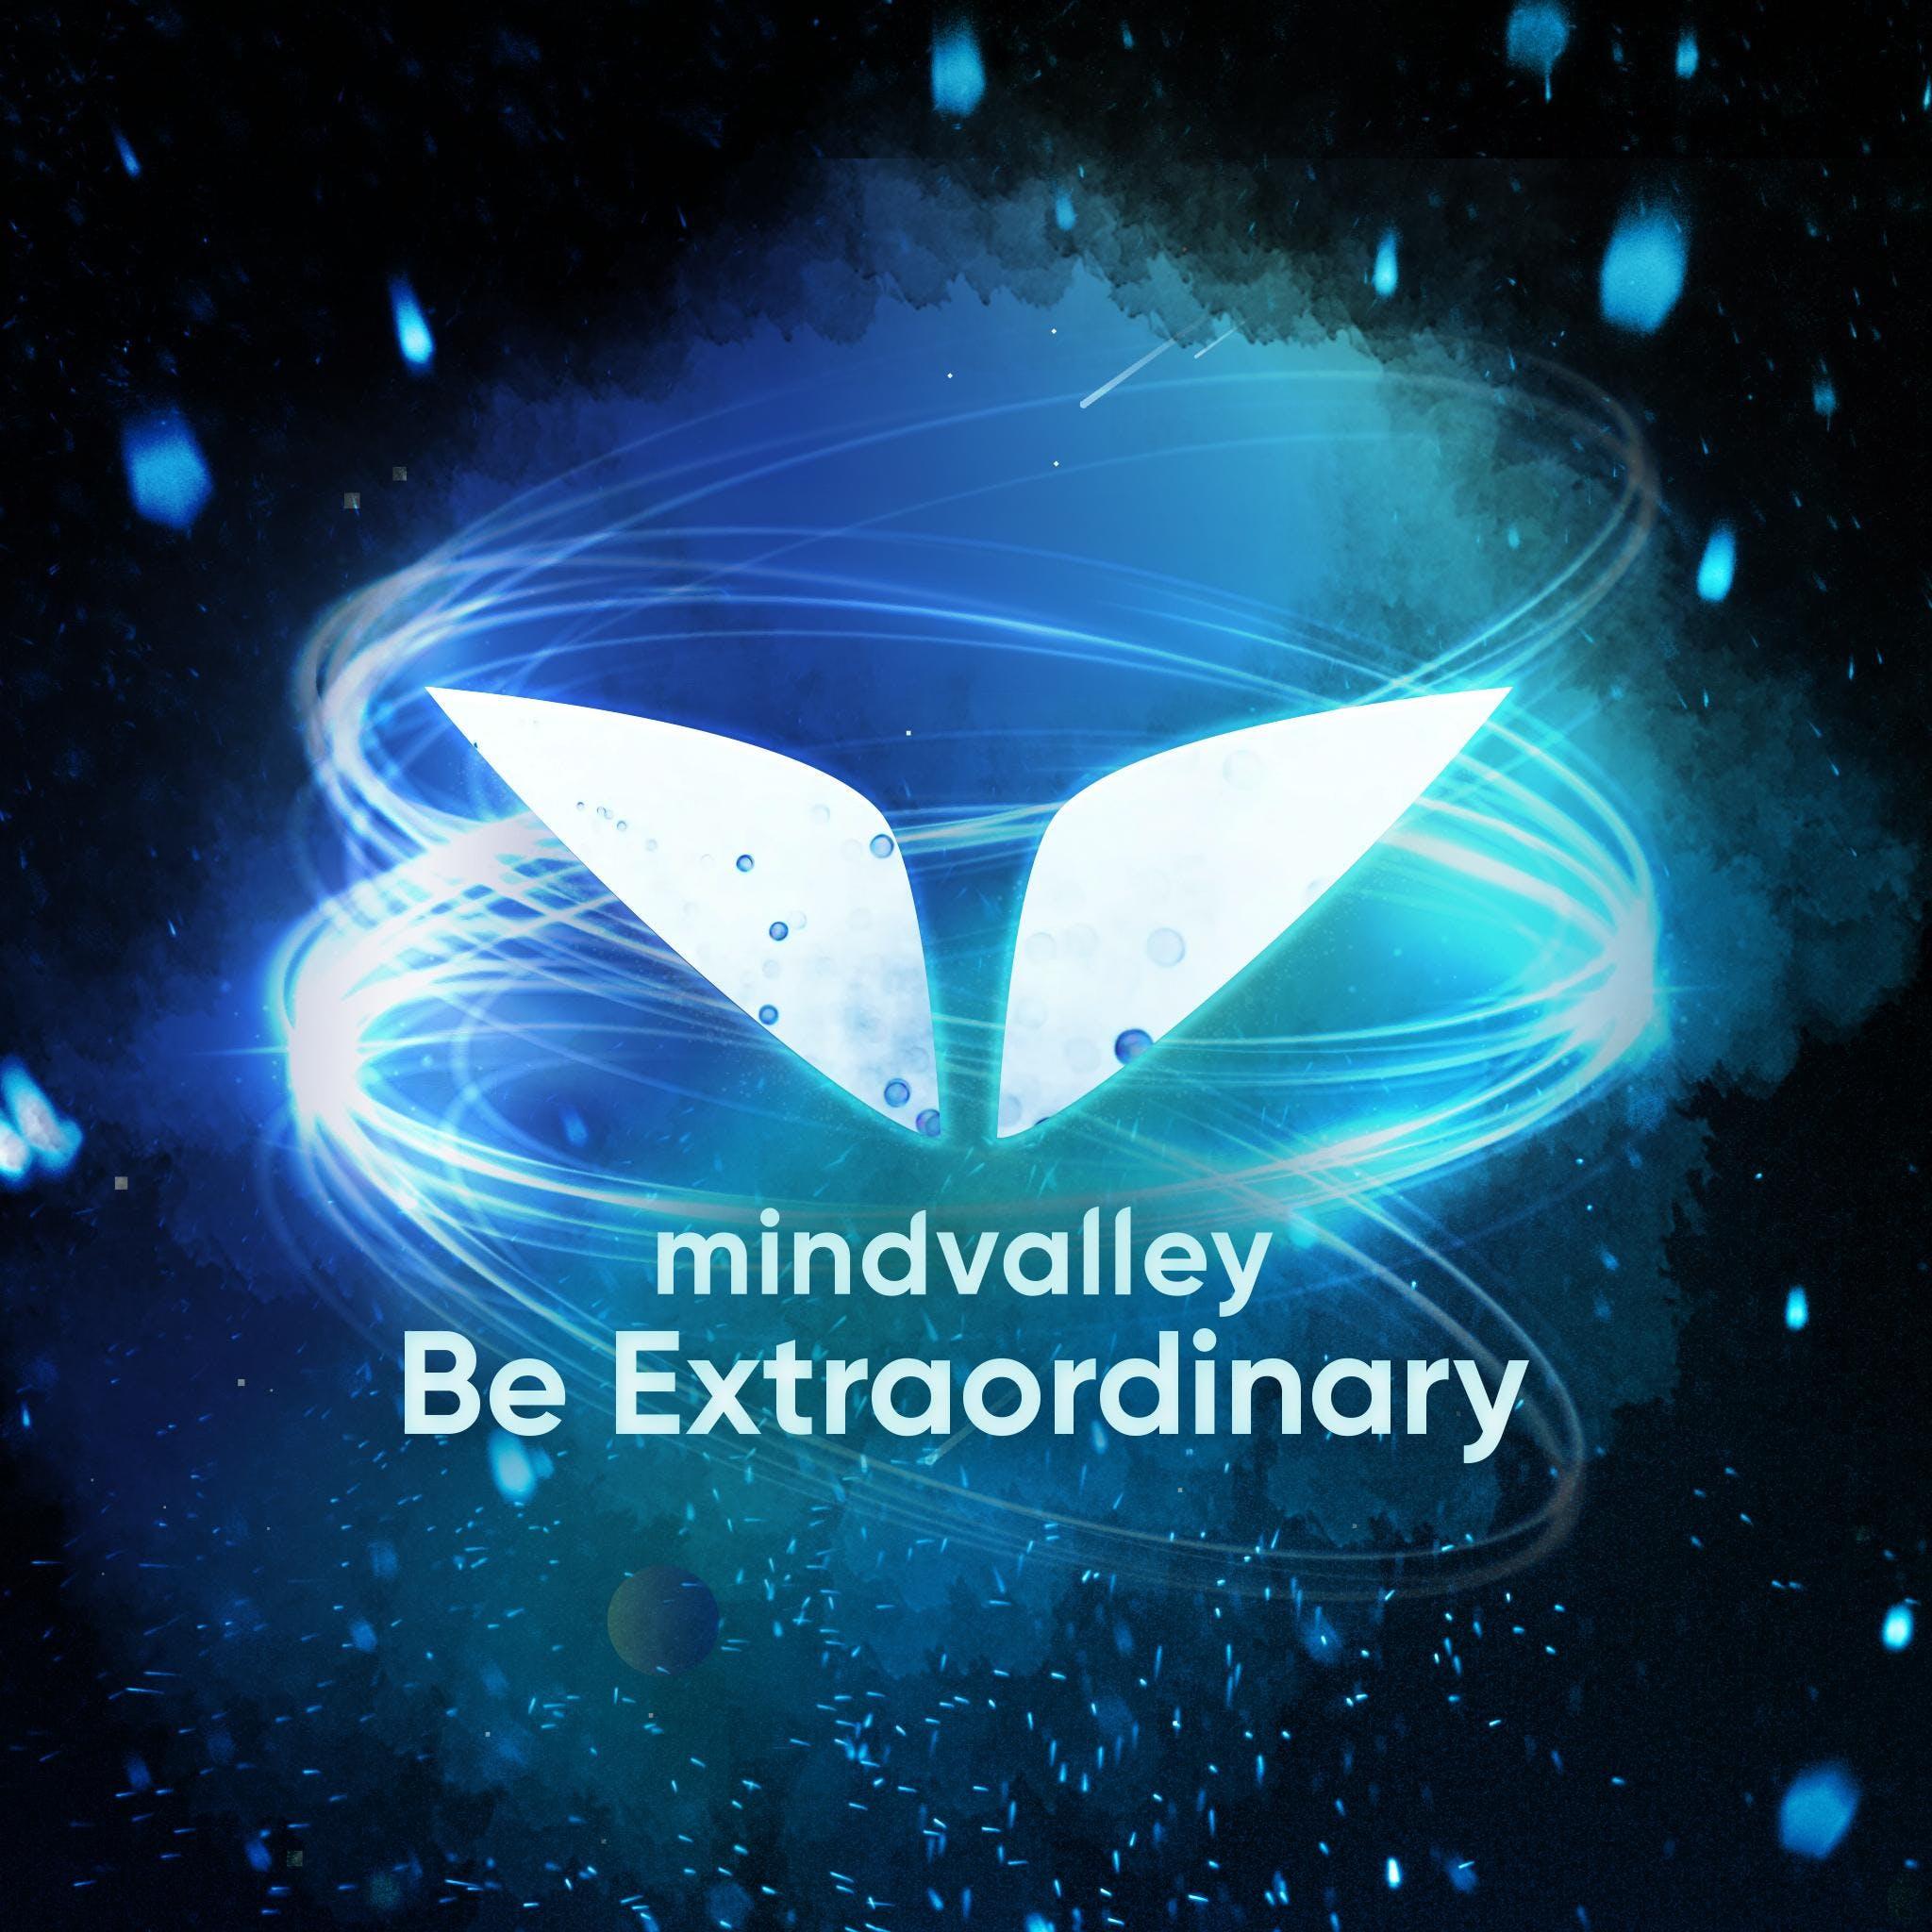 Mindvalley 'Be Extraordinary' Seminar is coming back to Arizona!